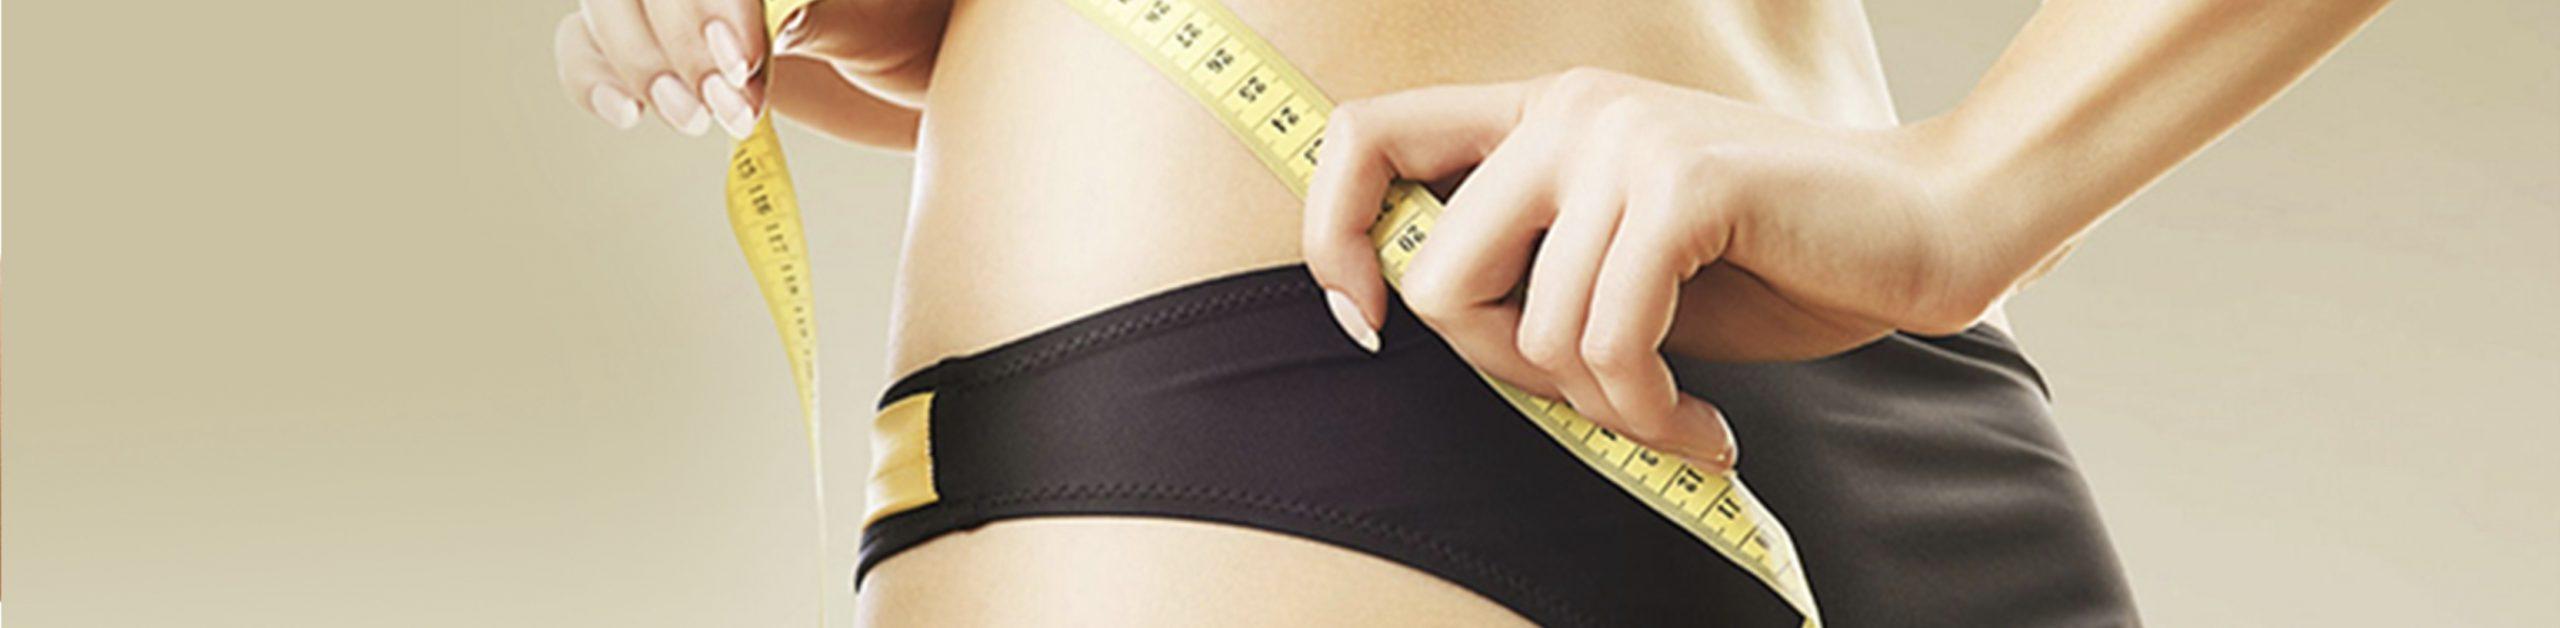 Appareil minceur & anti-cellulite